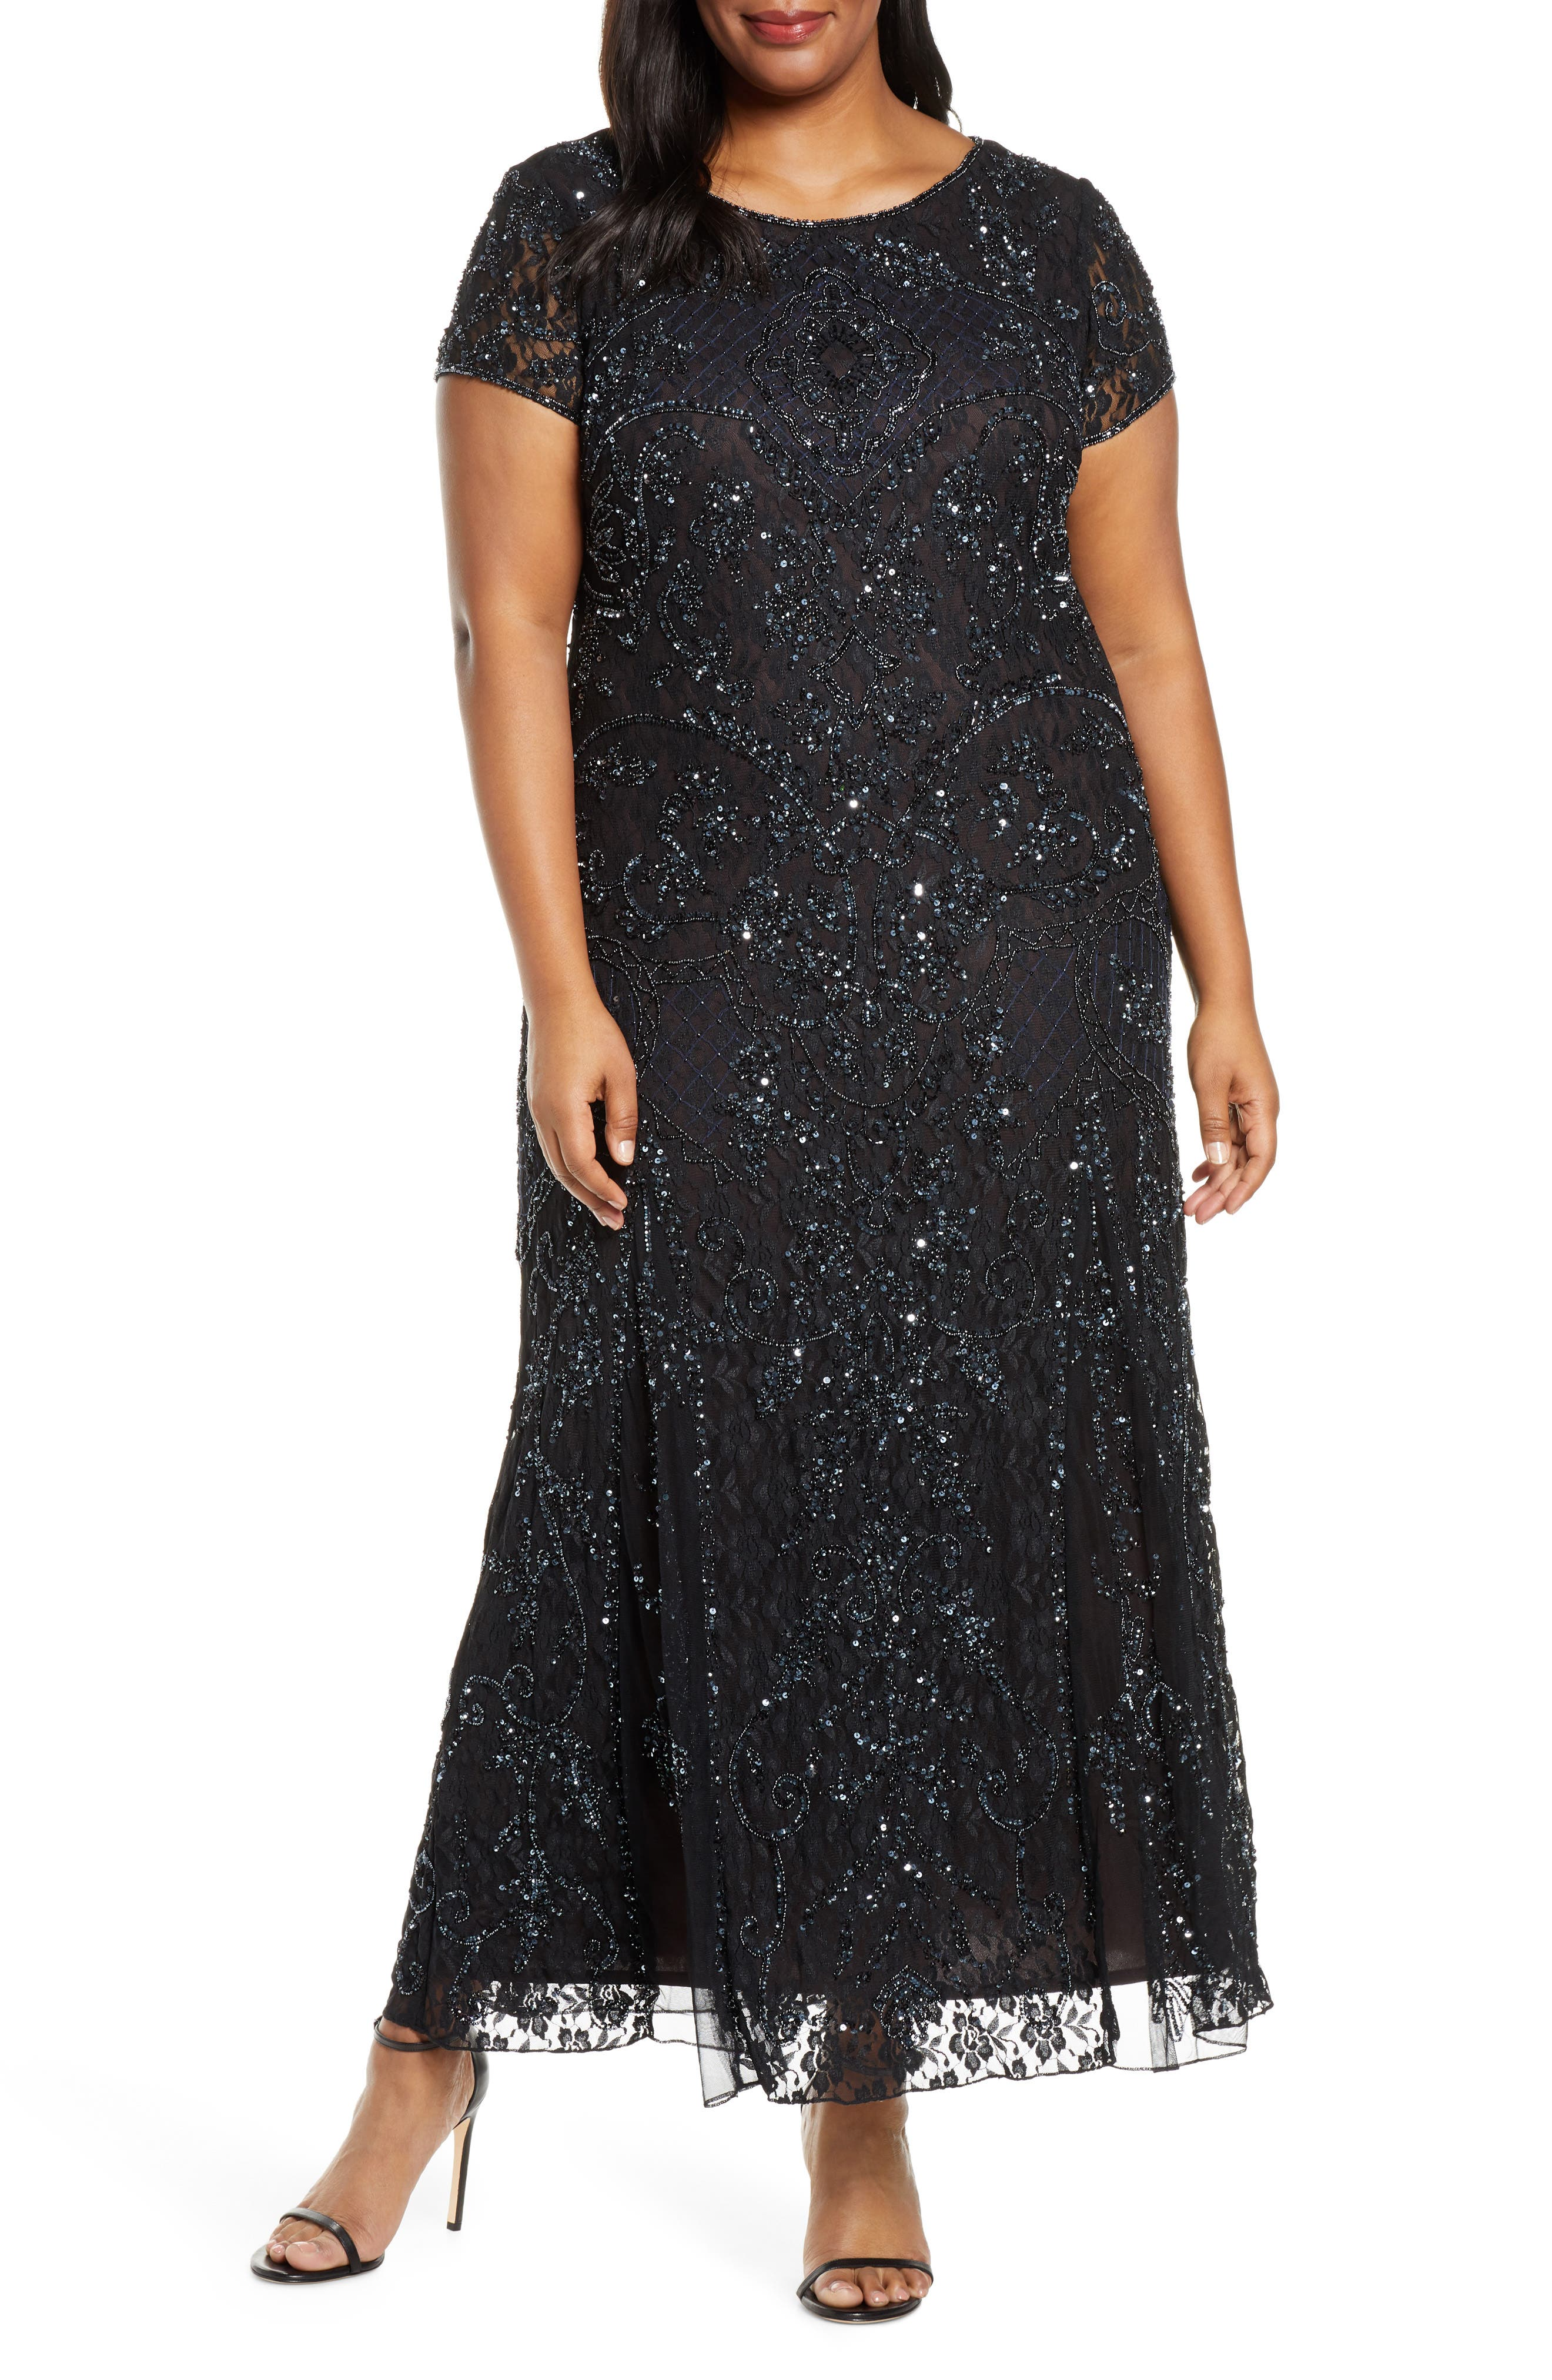 Vintage 1920s Dresses – Where to Buy Plus Size Womens Pisarro Nights Embellished Lace A-Line Dress Size 14W - Black $258.00 AT vintagedancer.com